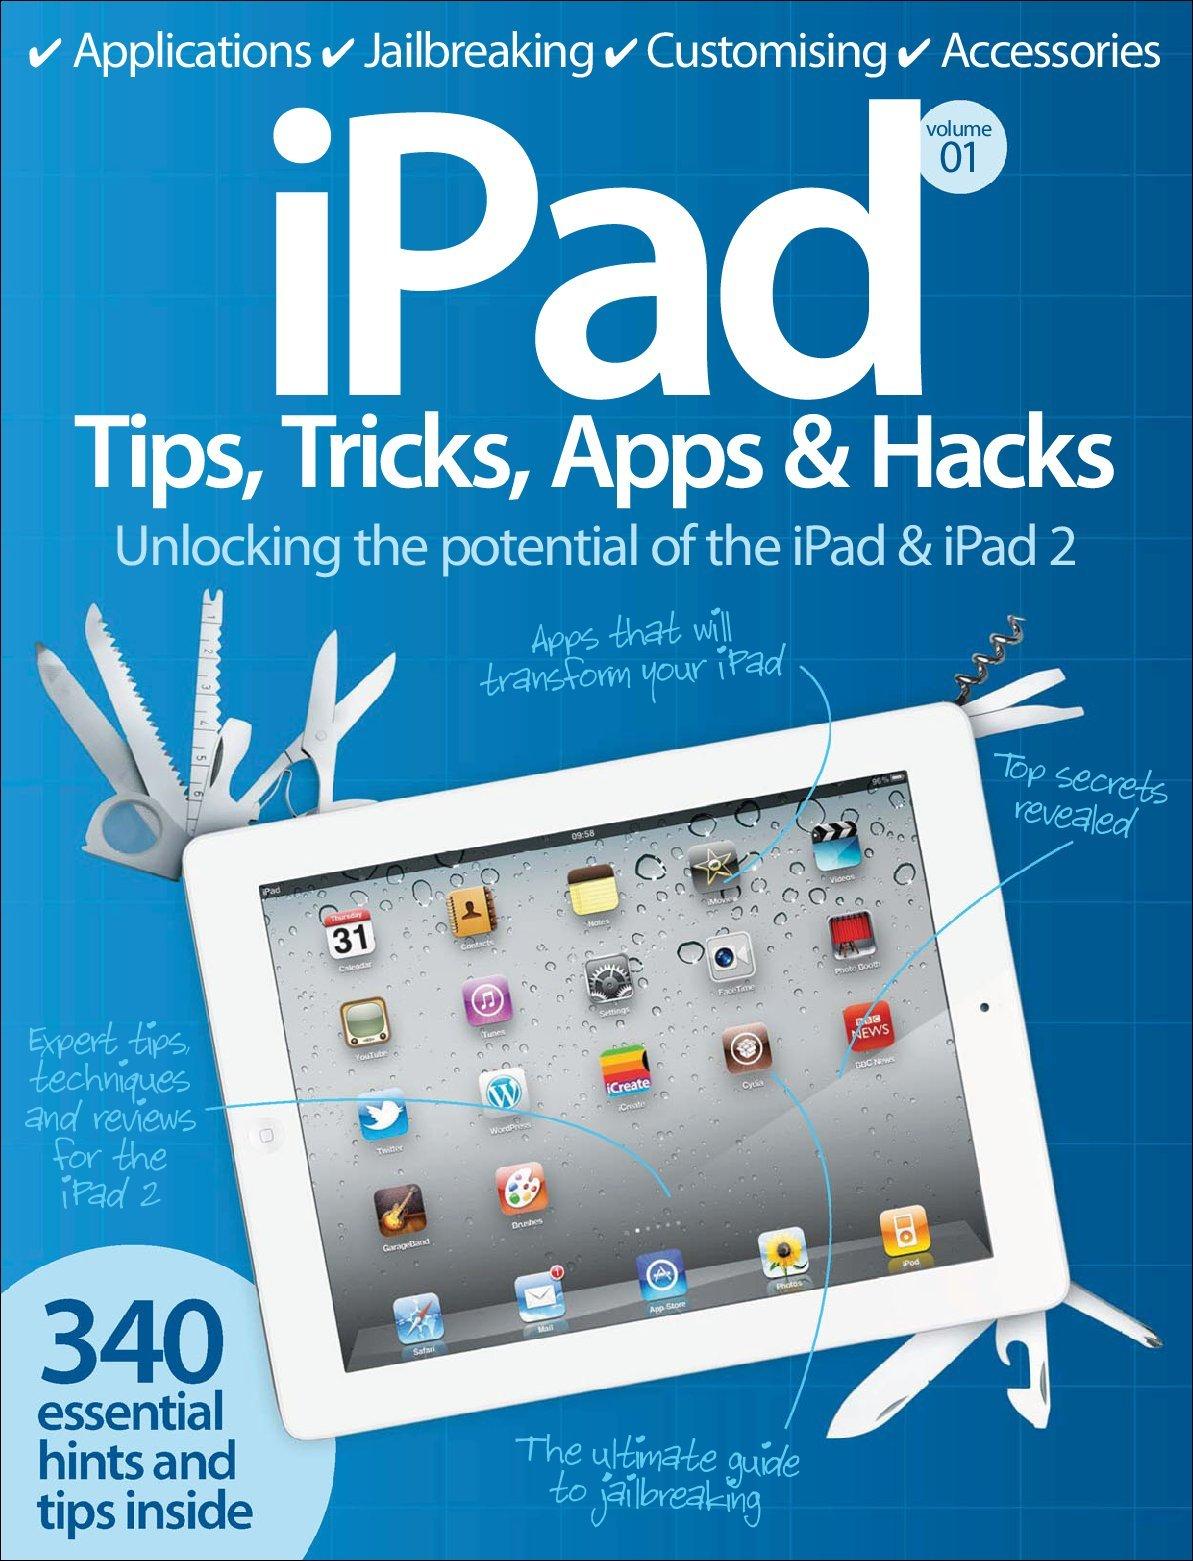 Ipad tips tricks apps amp hacks vol 1 digital magazine